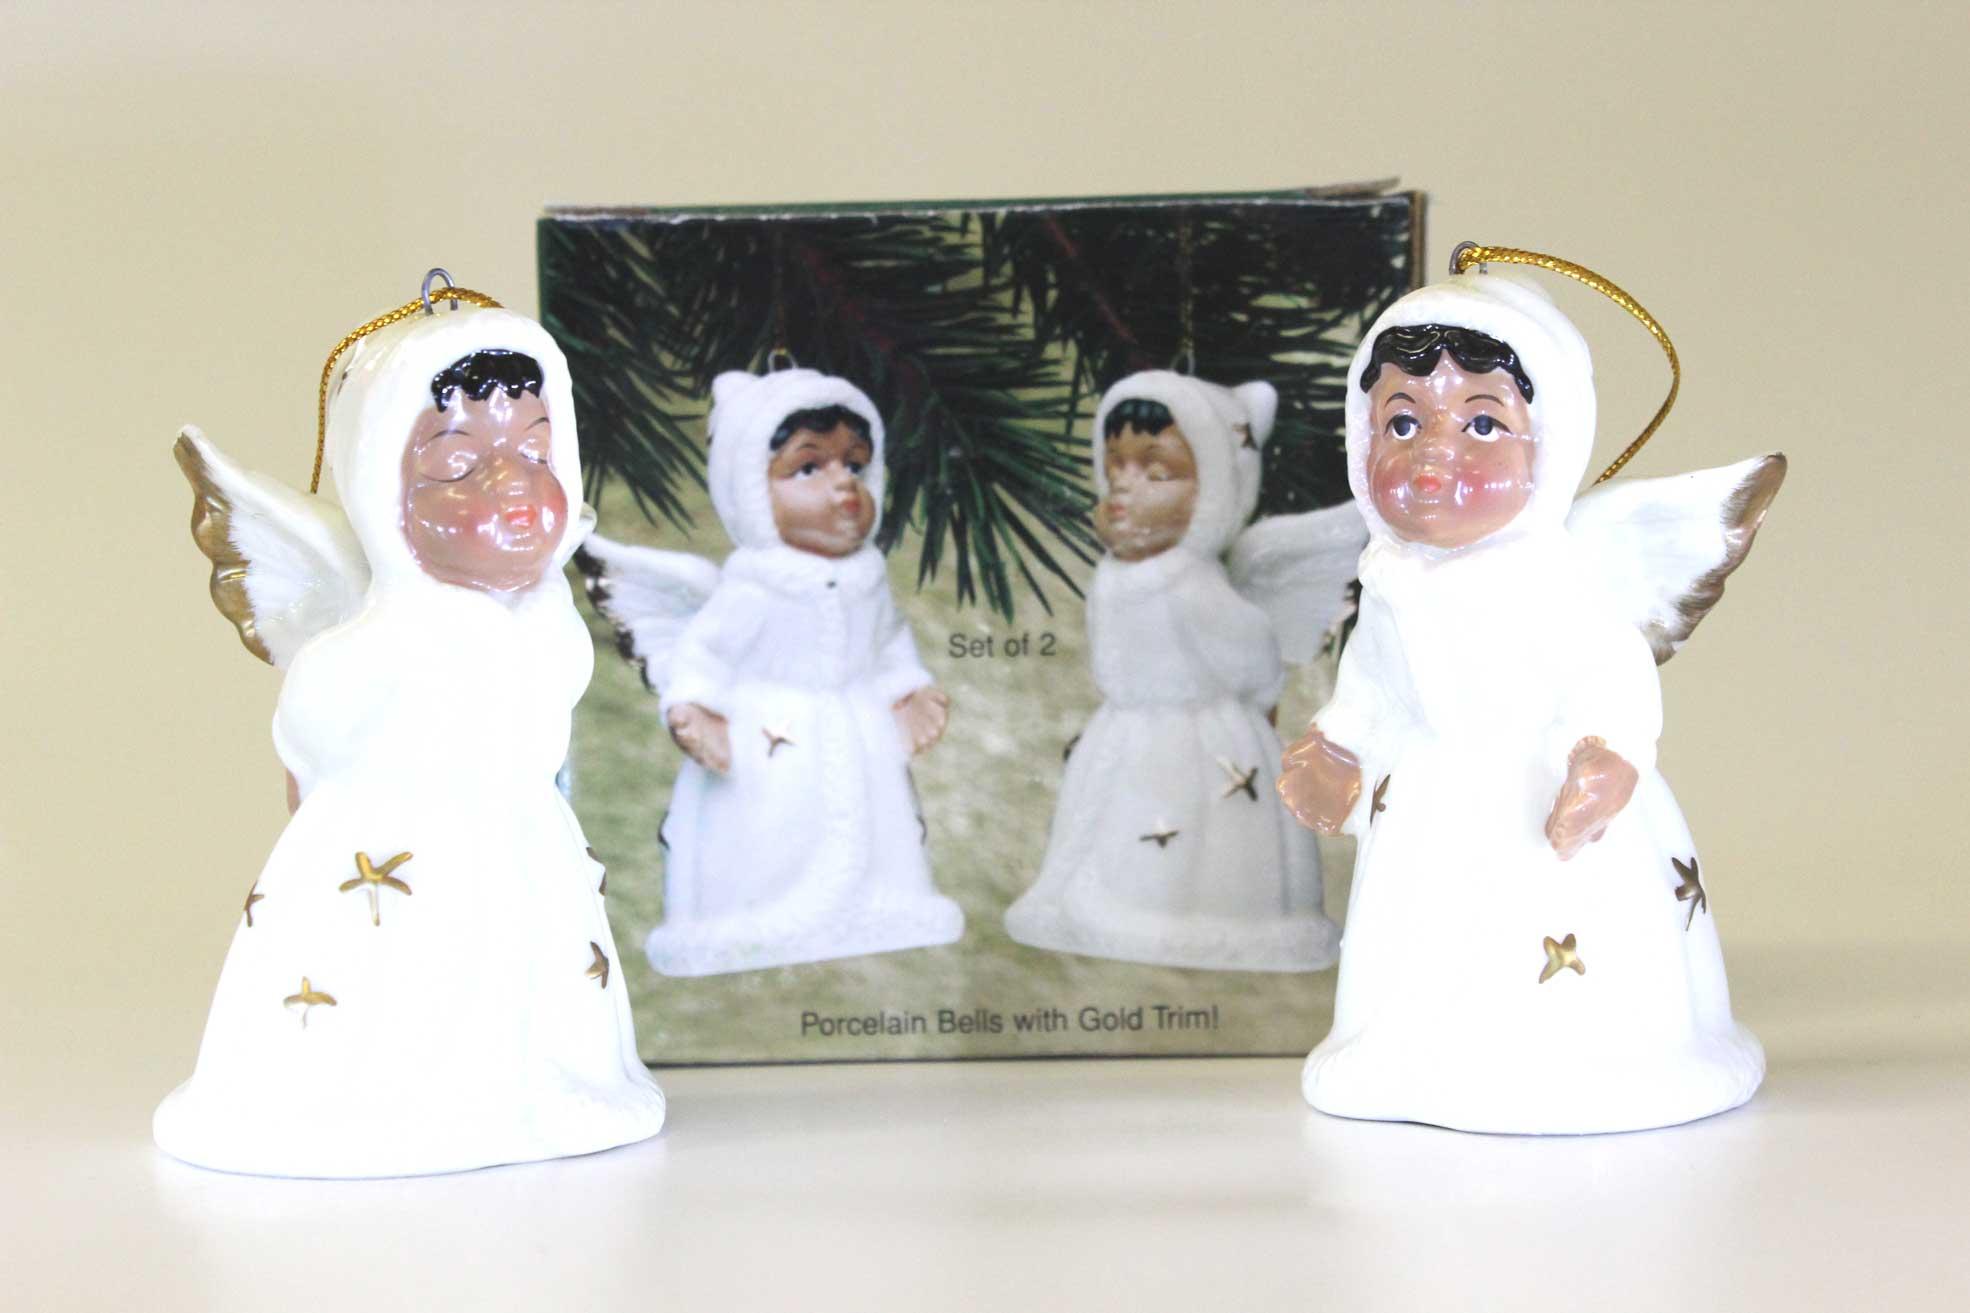 Porcelain Angel Bells Set of 2 - Christian Gifts - Holiday Gifts Mart